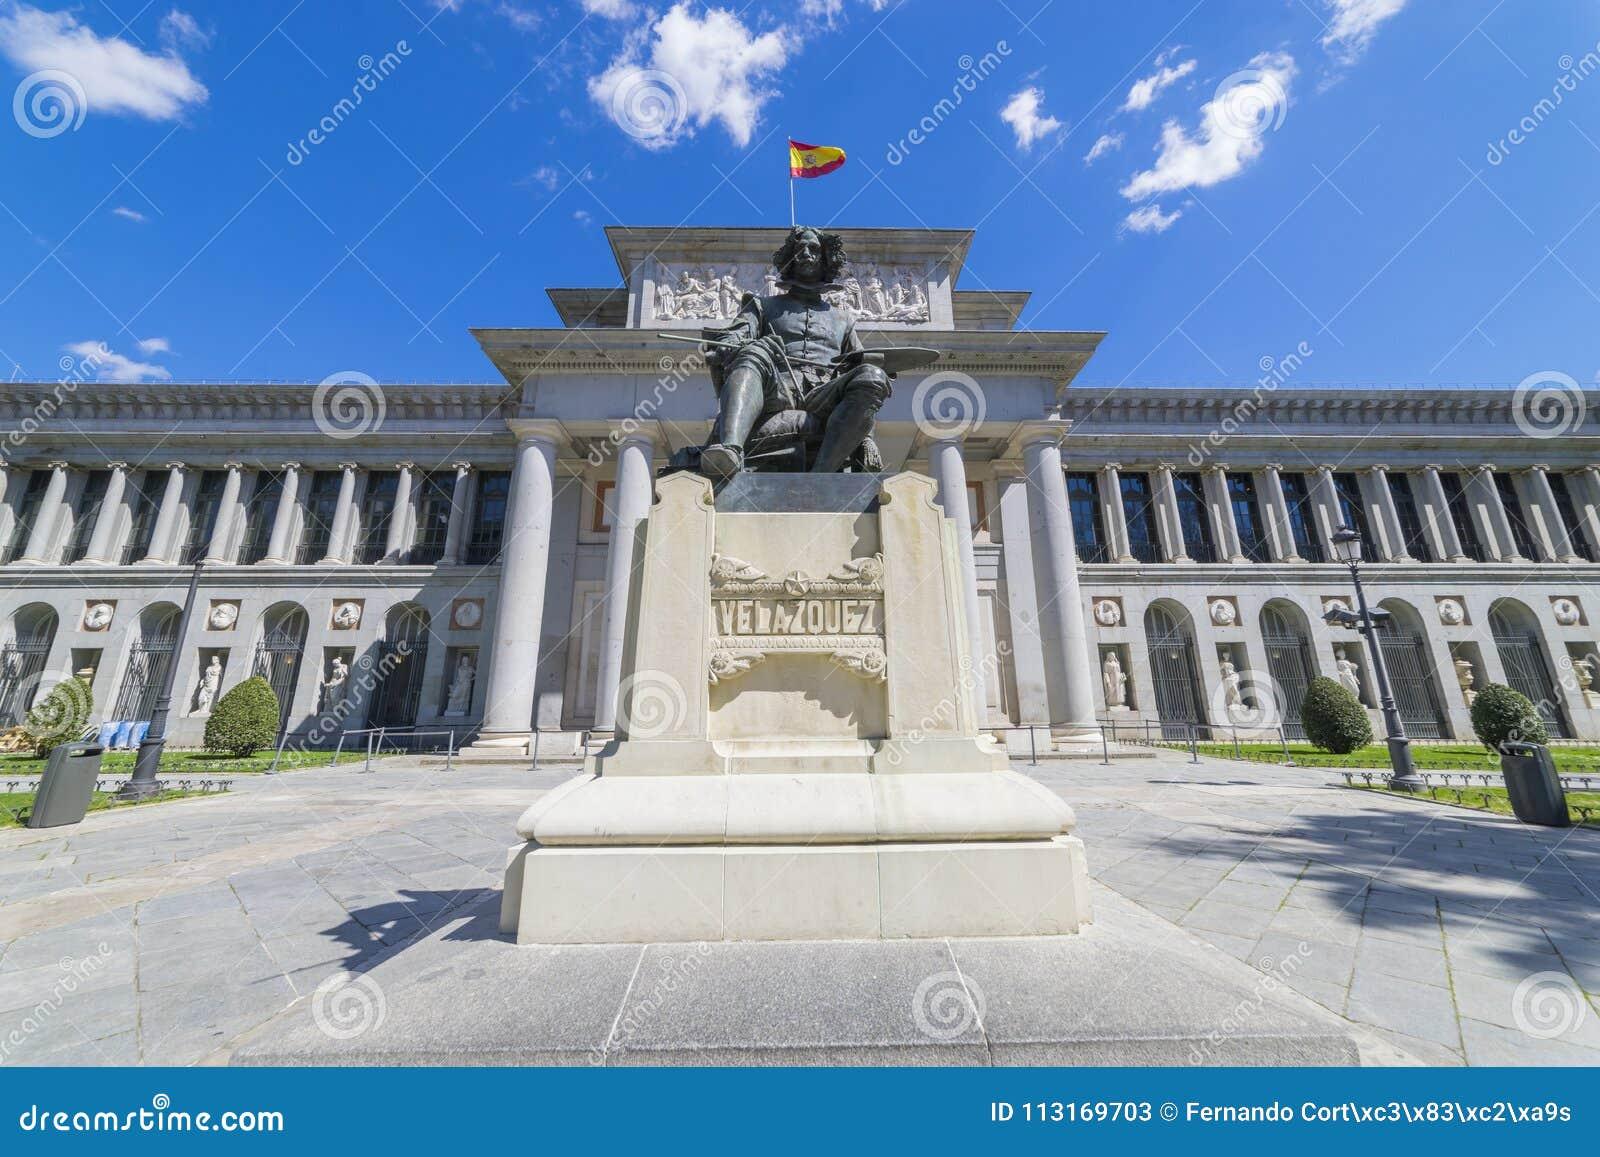 Façade principale du musée de Prado, vieille galerie d art en Espagne, Madri